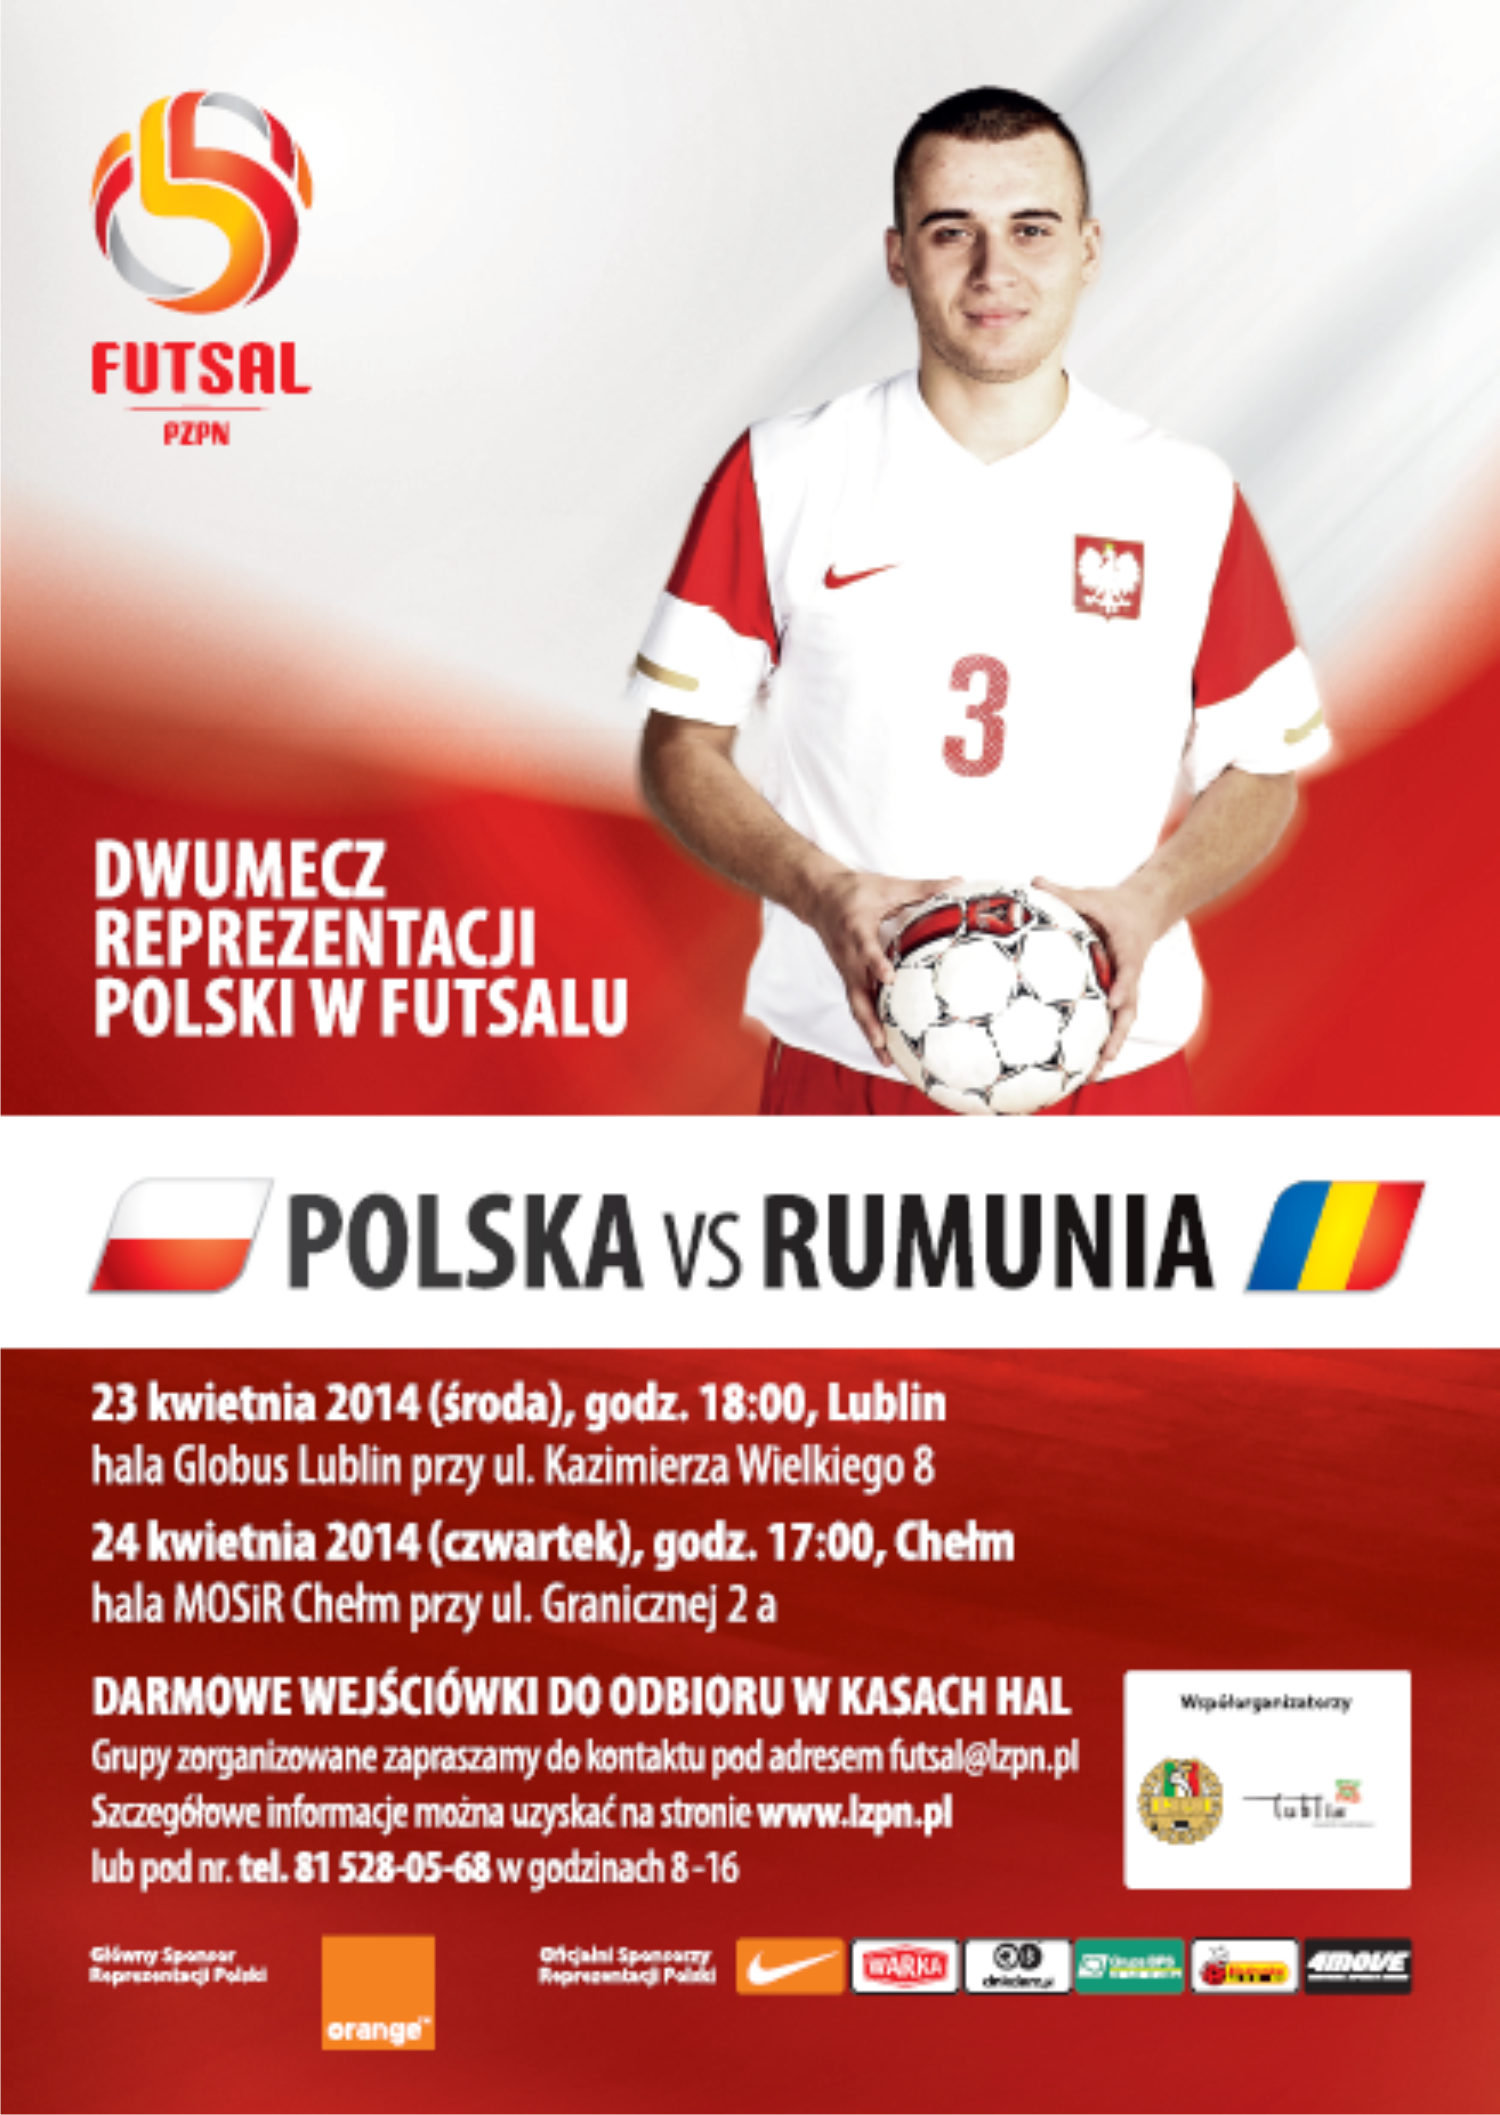 rumunia polska